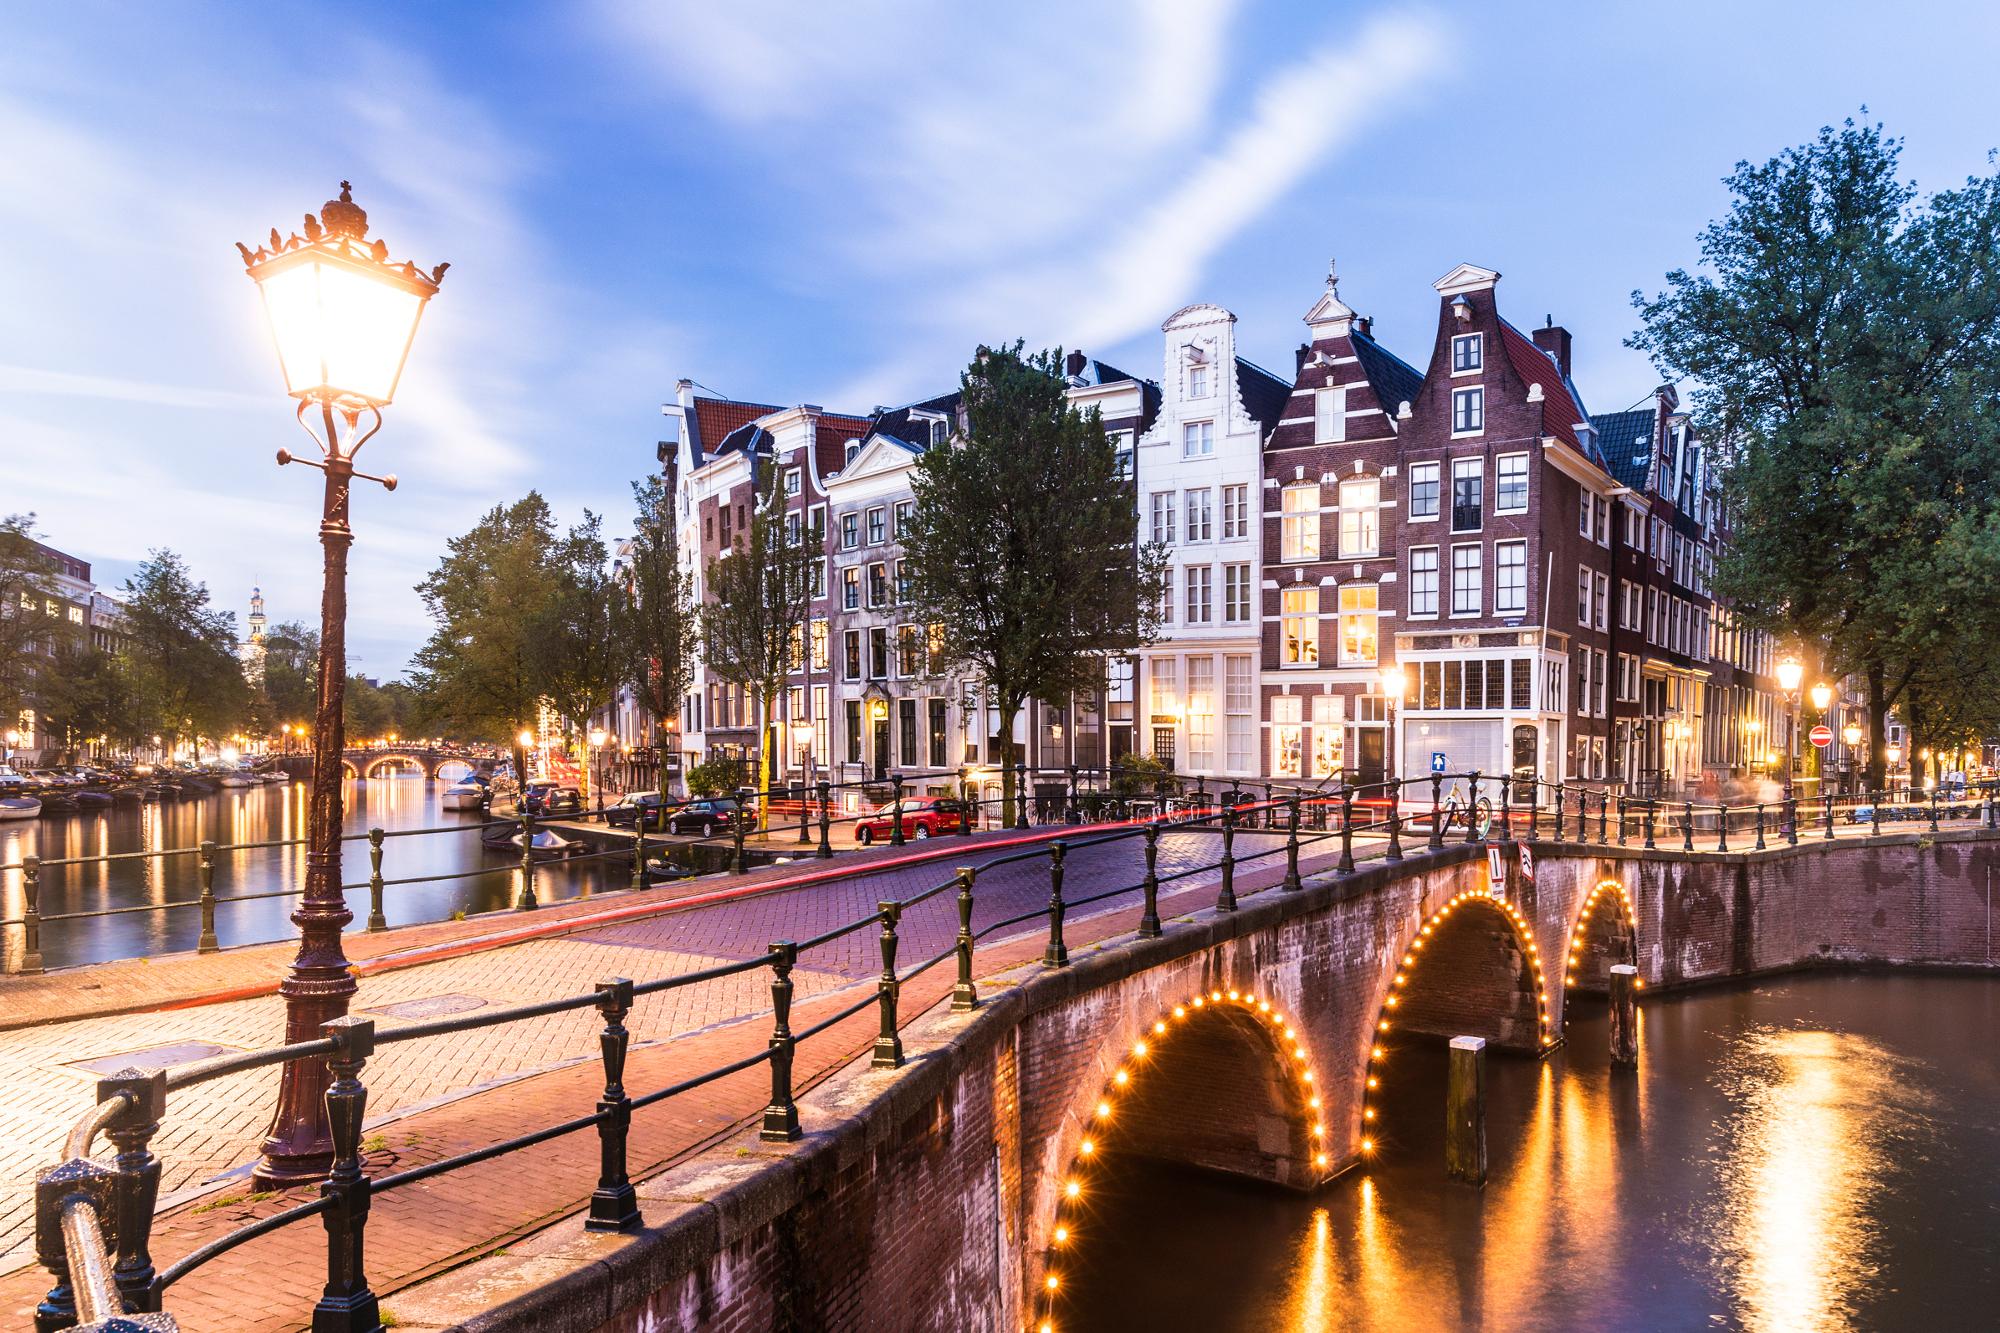 Niederlande Zeitzone